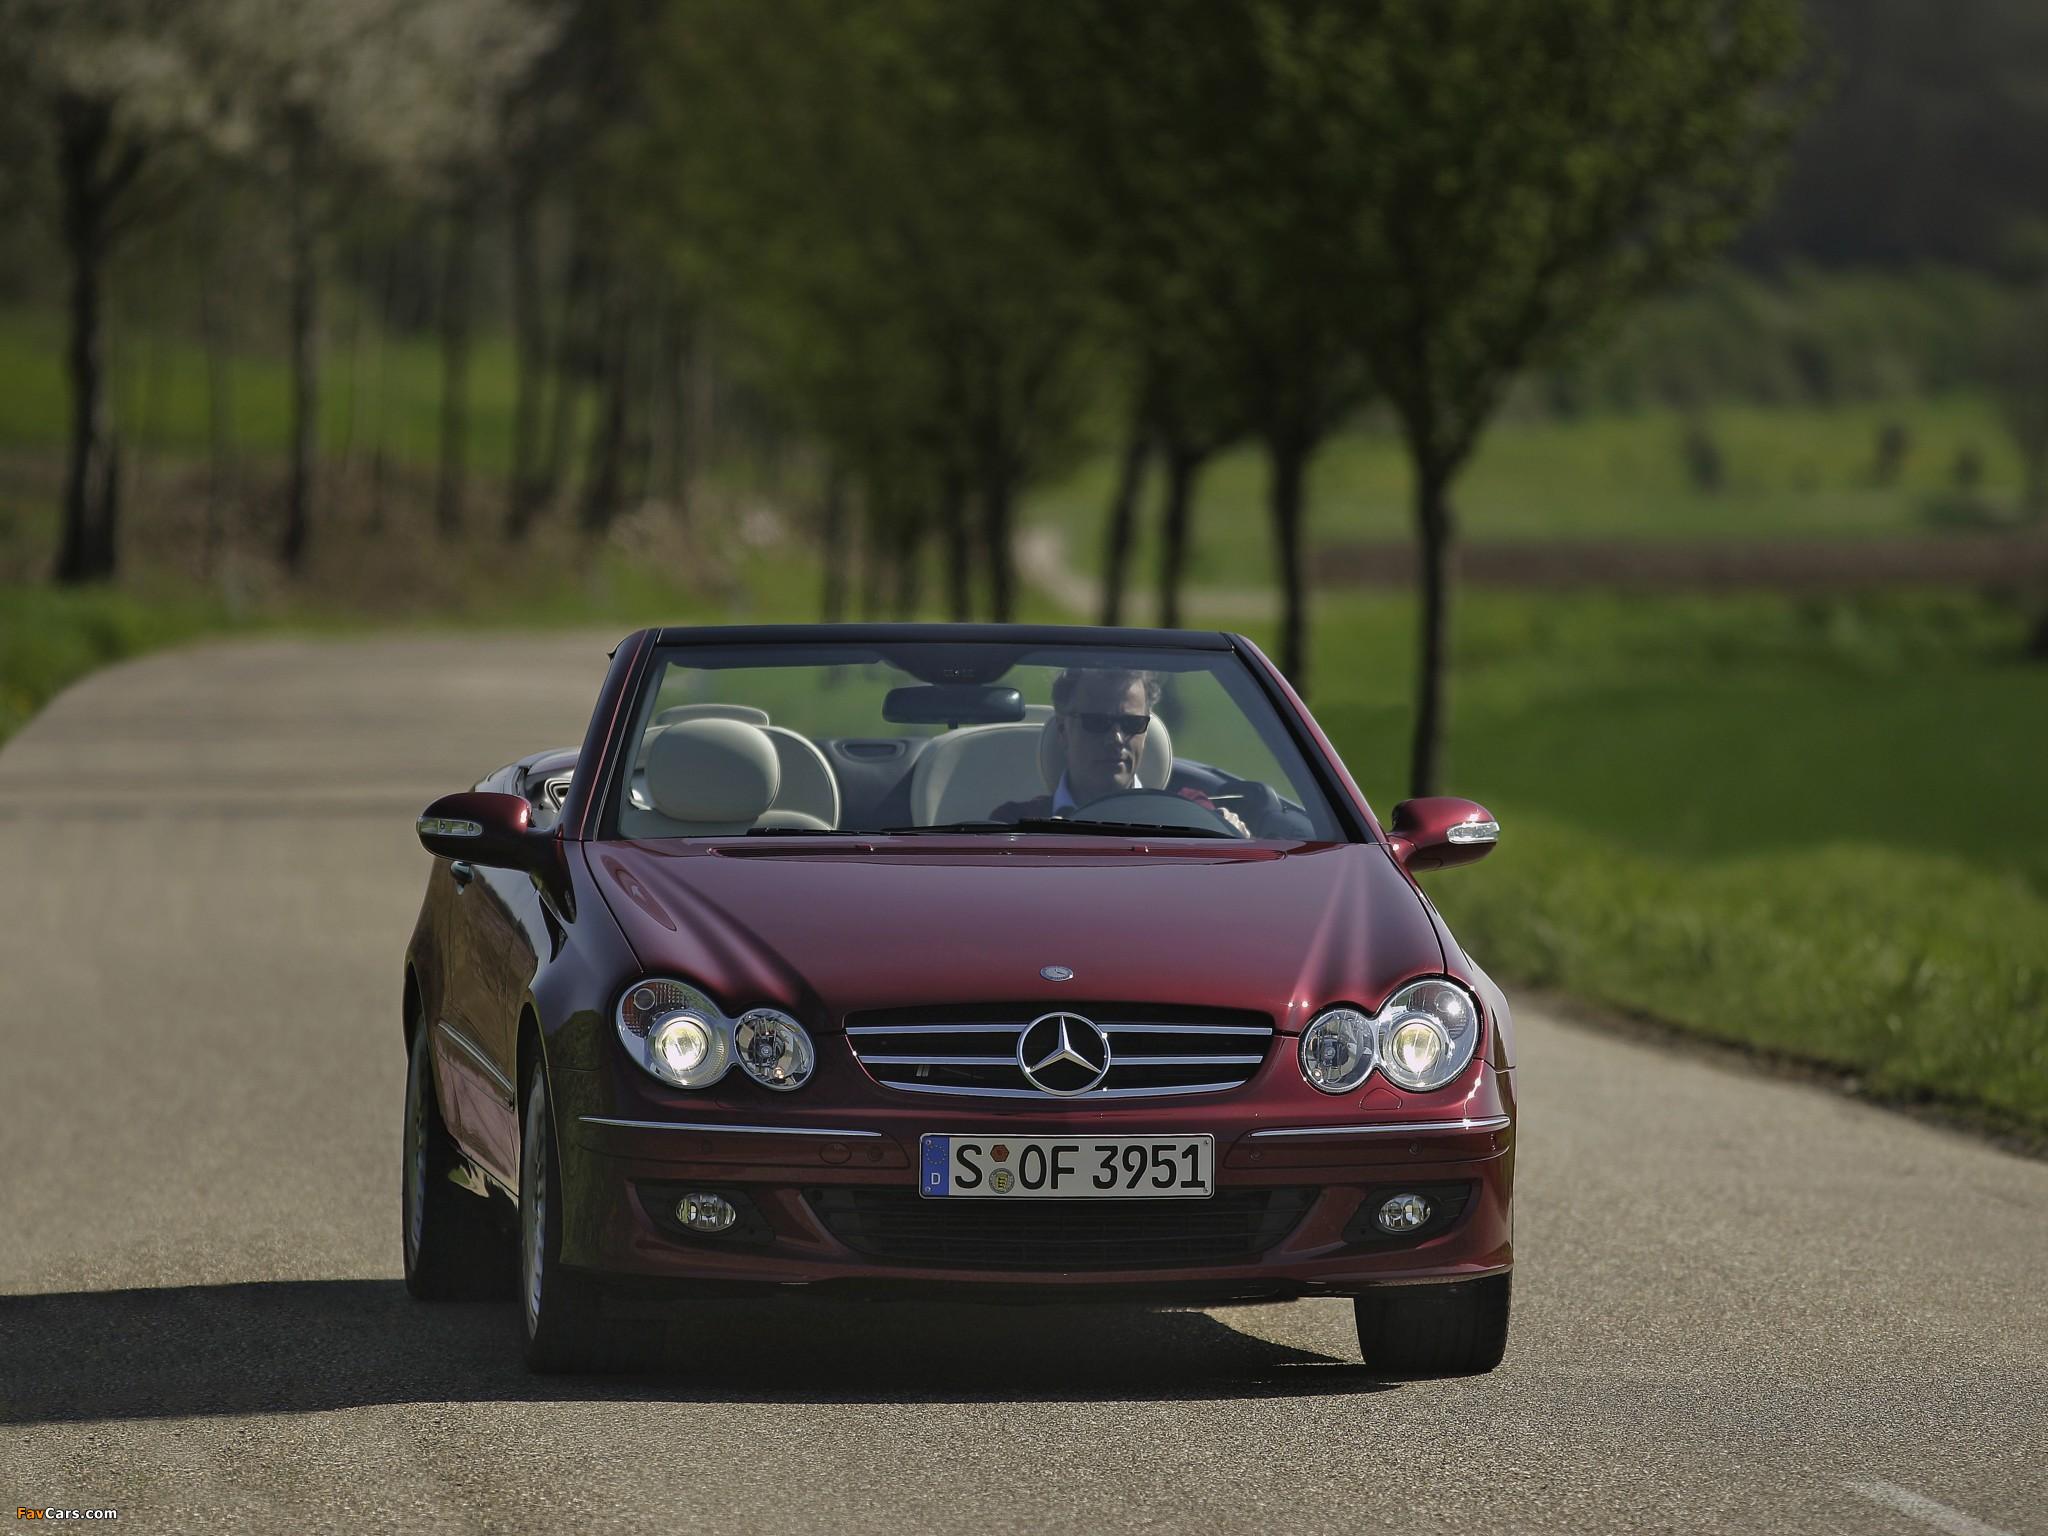 Mercedes-Benz CLK 320 CDI Cabrio (A209) 2005–10 wallpapers (2048 x 1536)